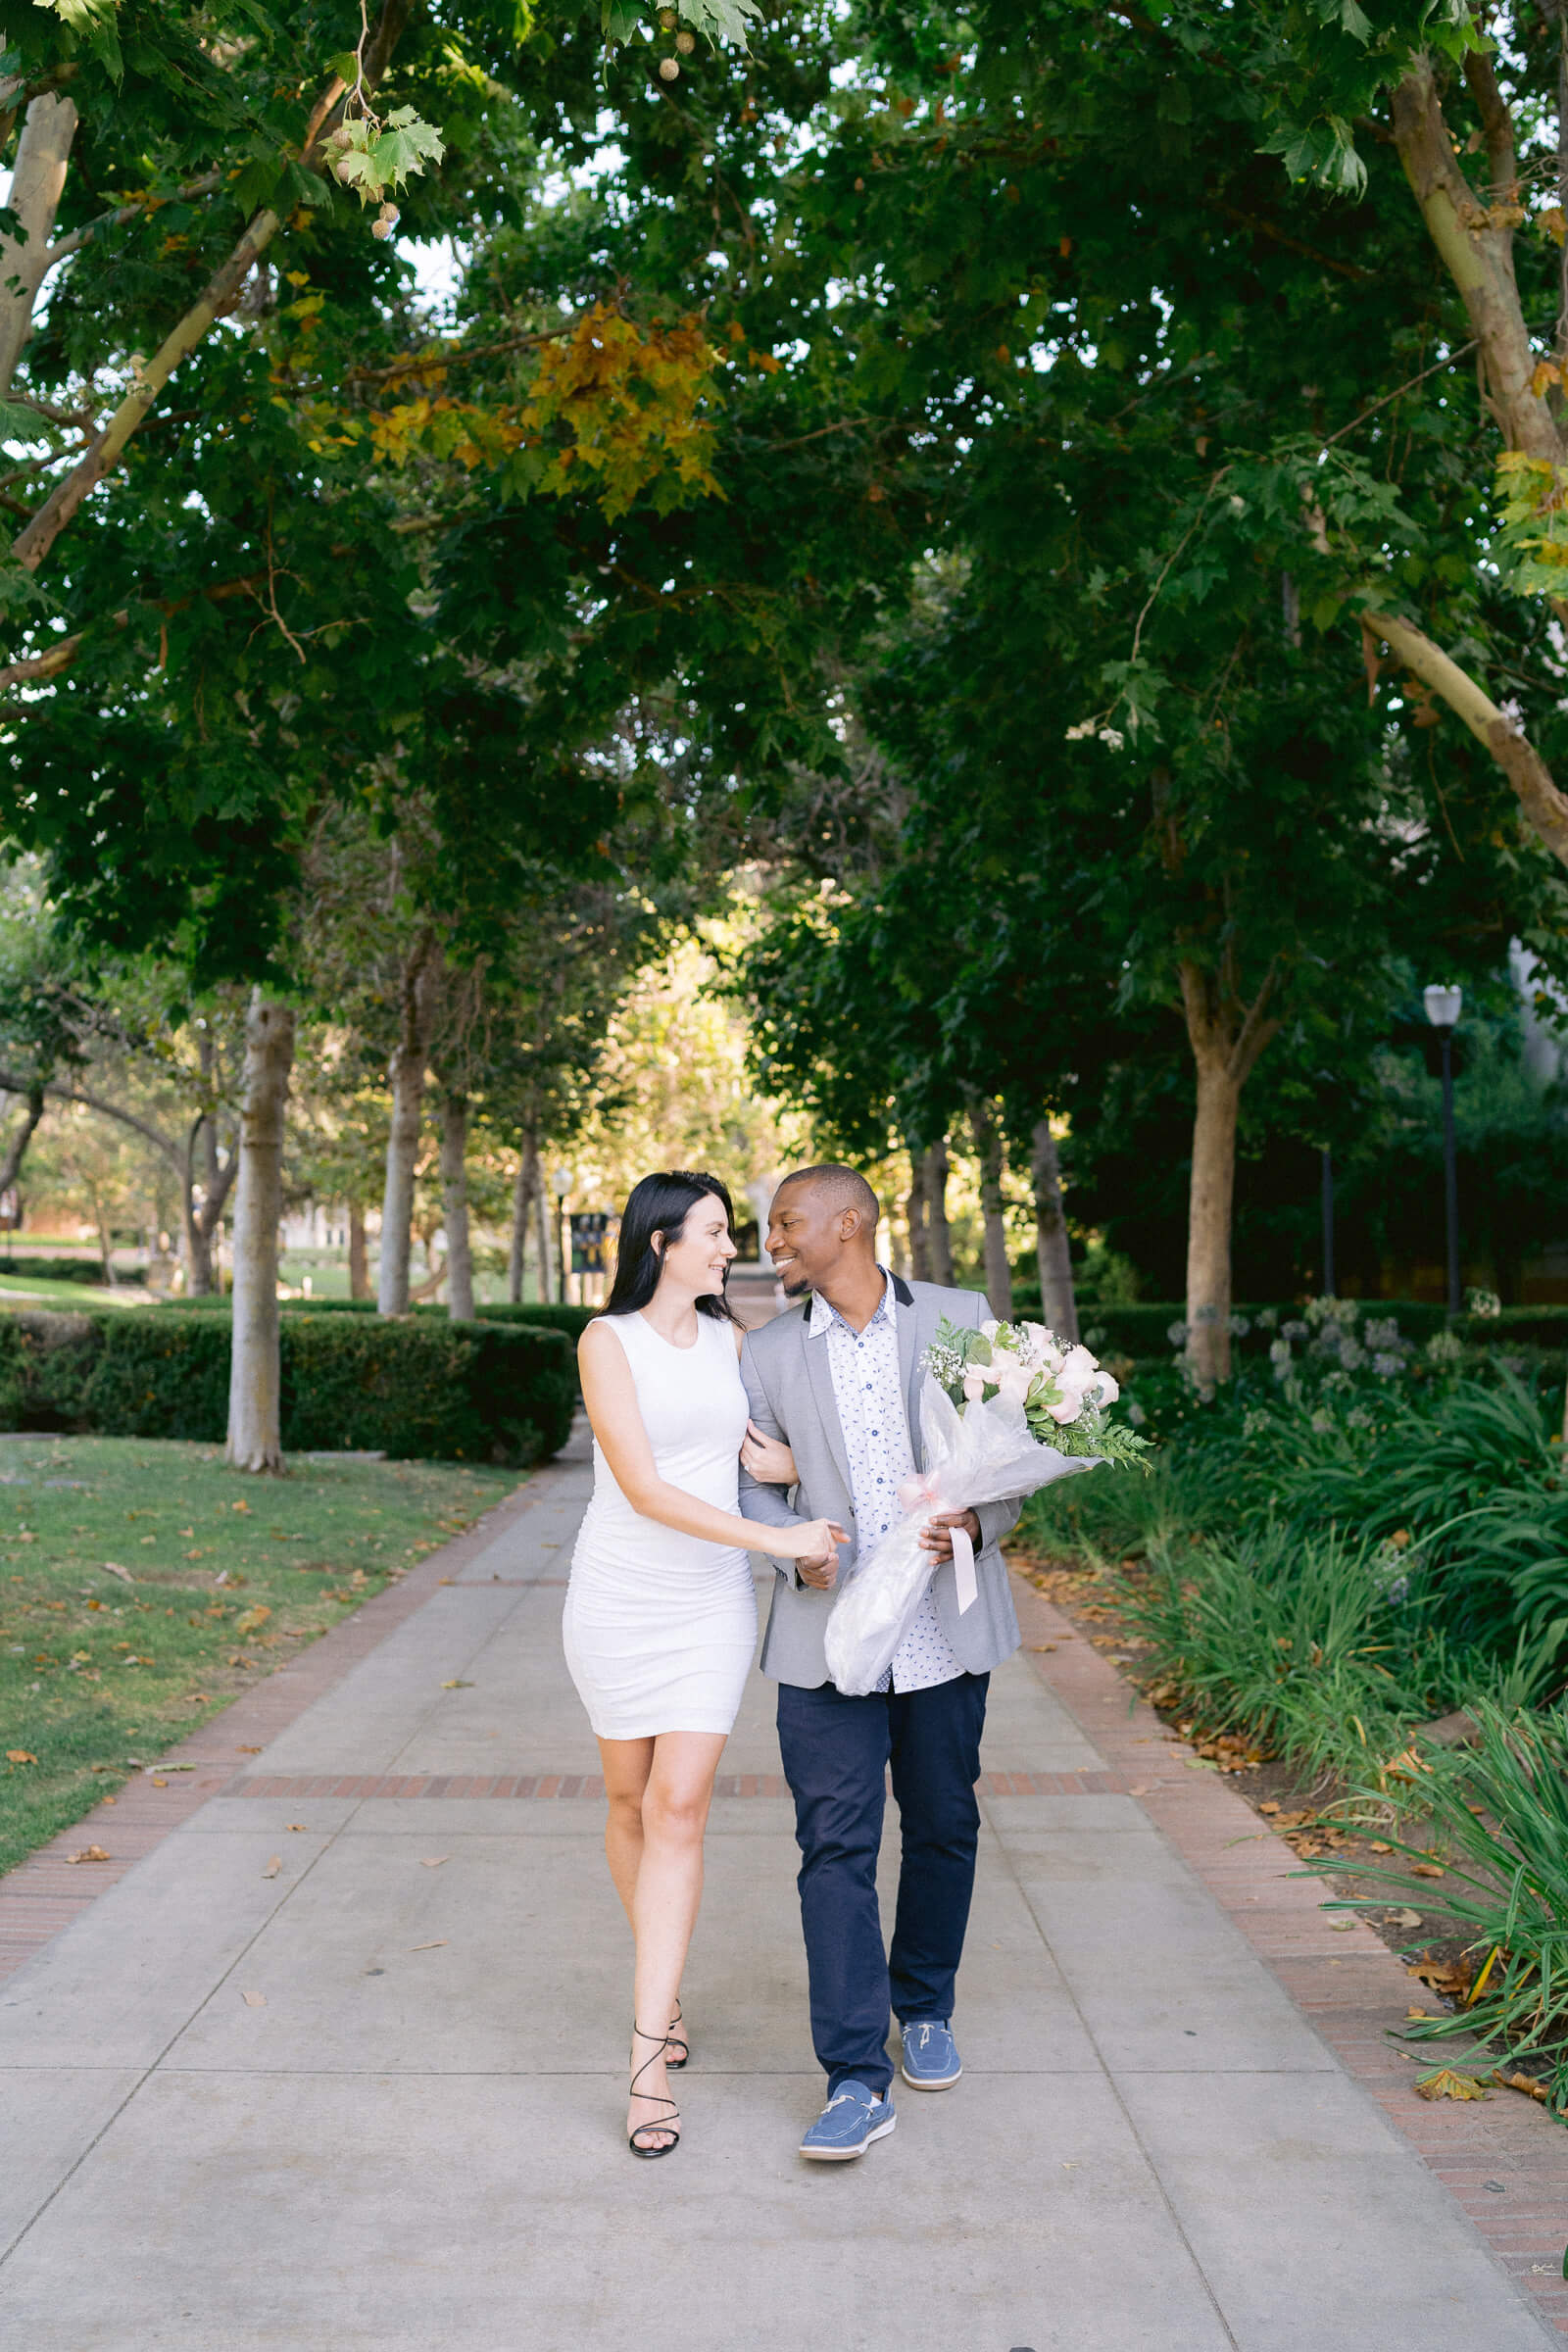 ucla-los-angeles-proposal-photographer-47.jpg